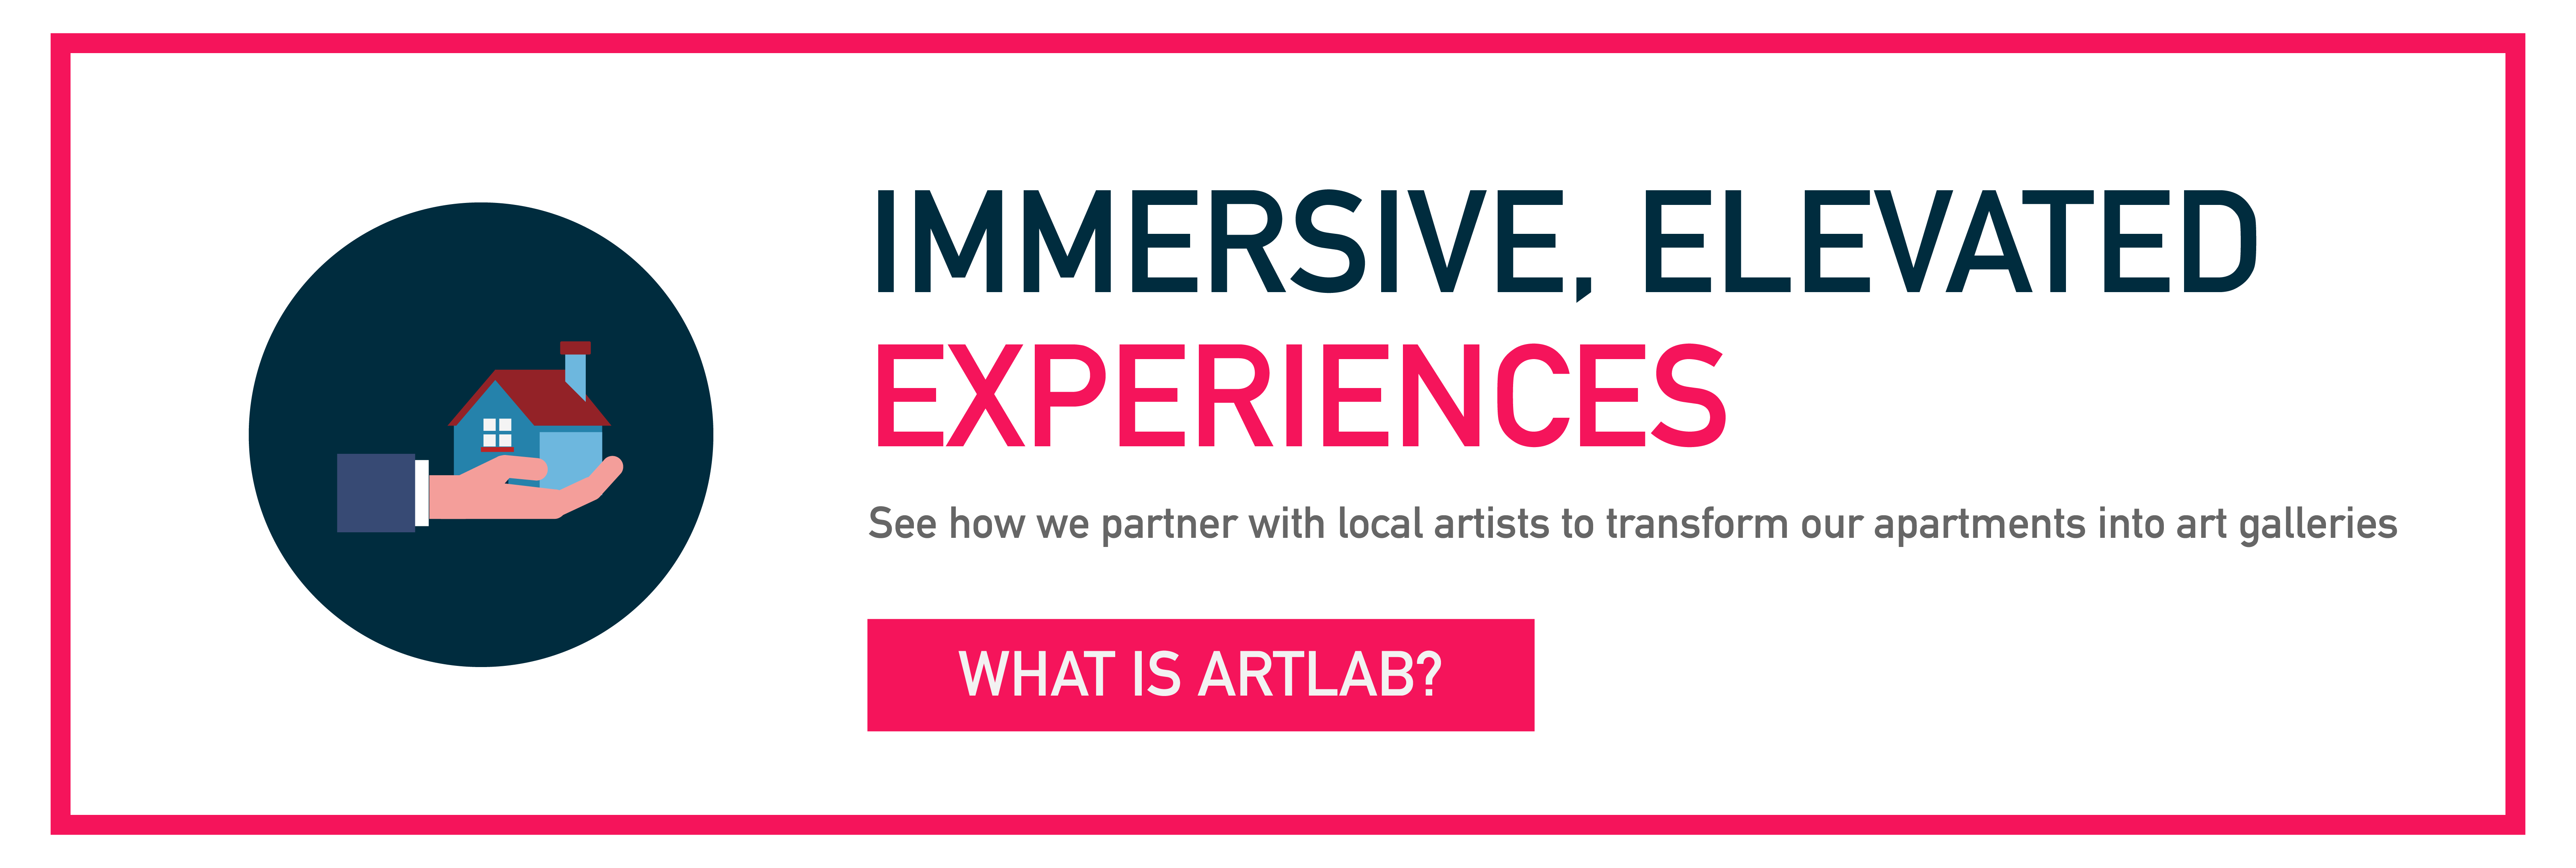 what is artlab CTA